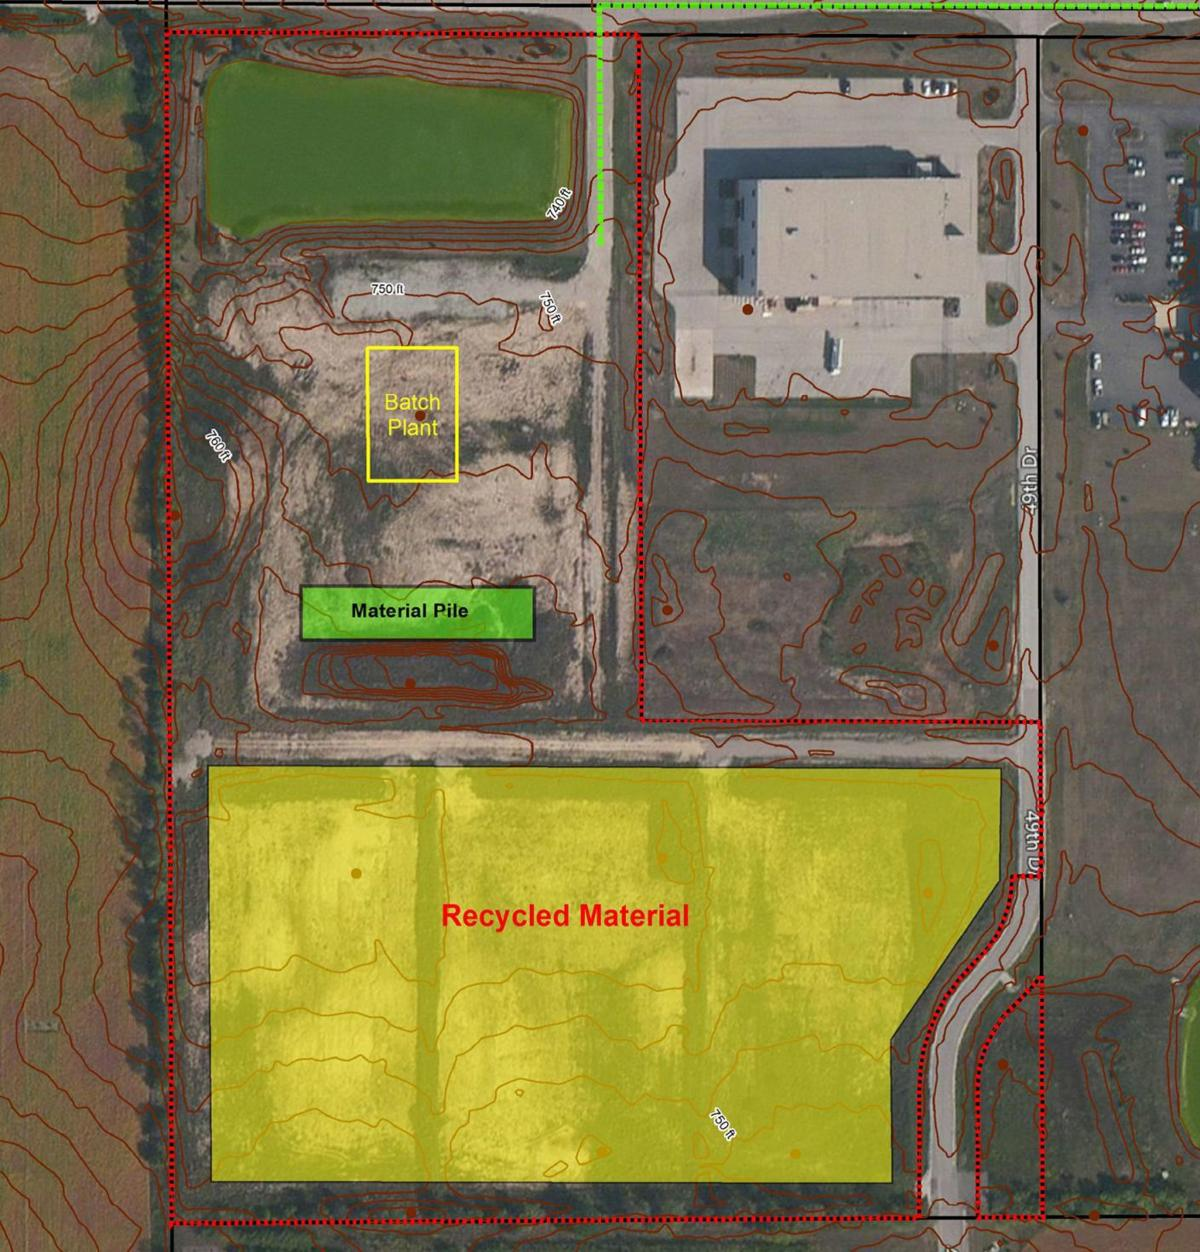 Proposed concrete plant location